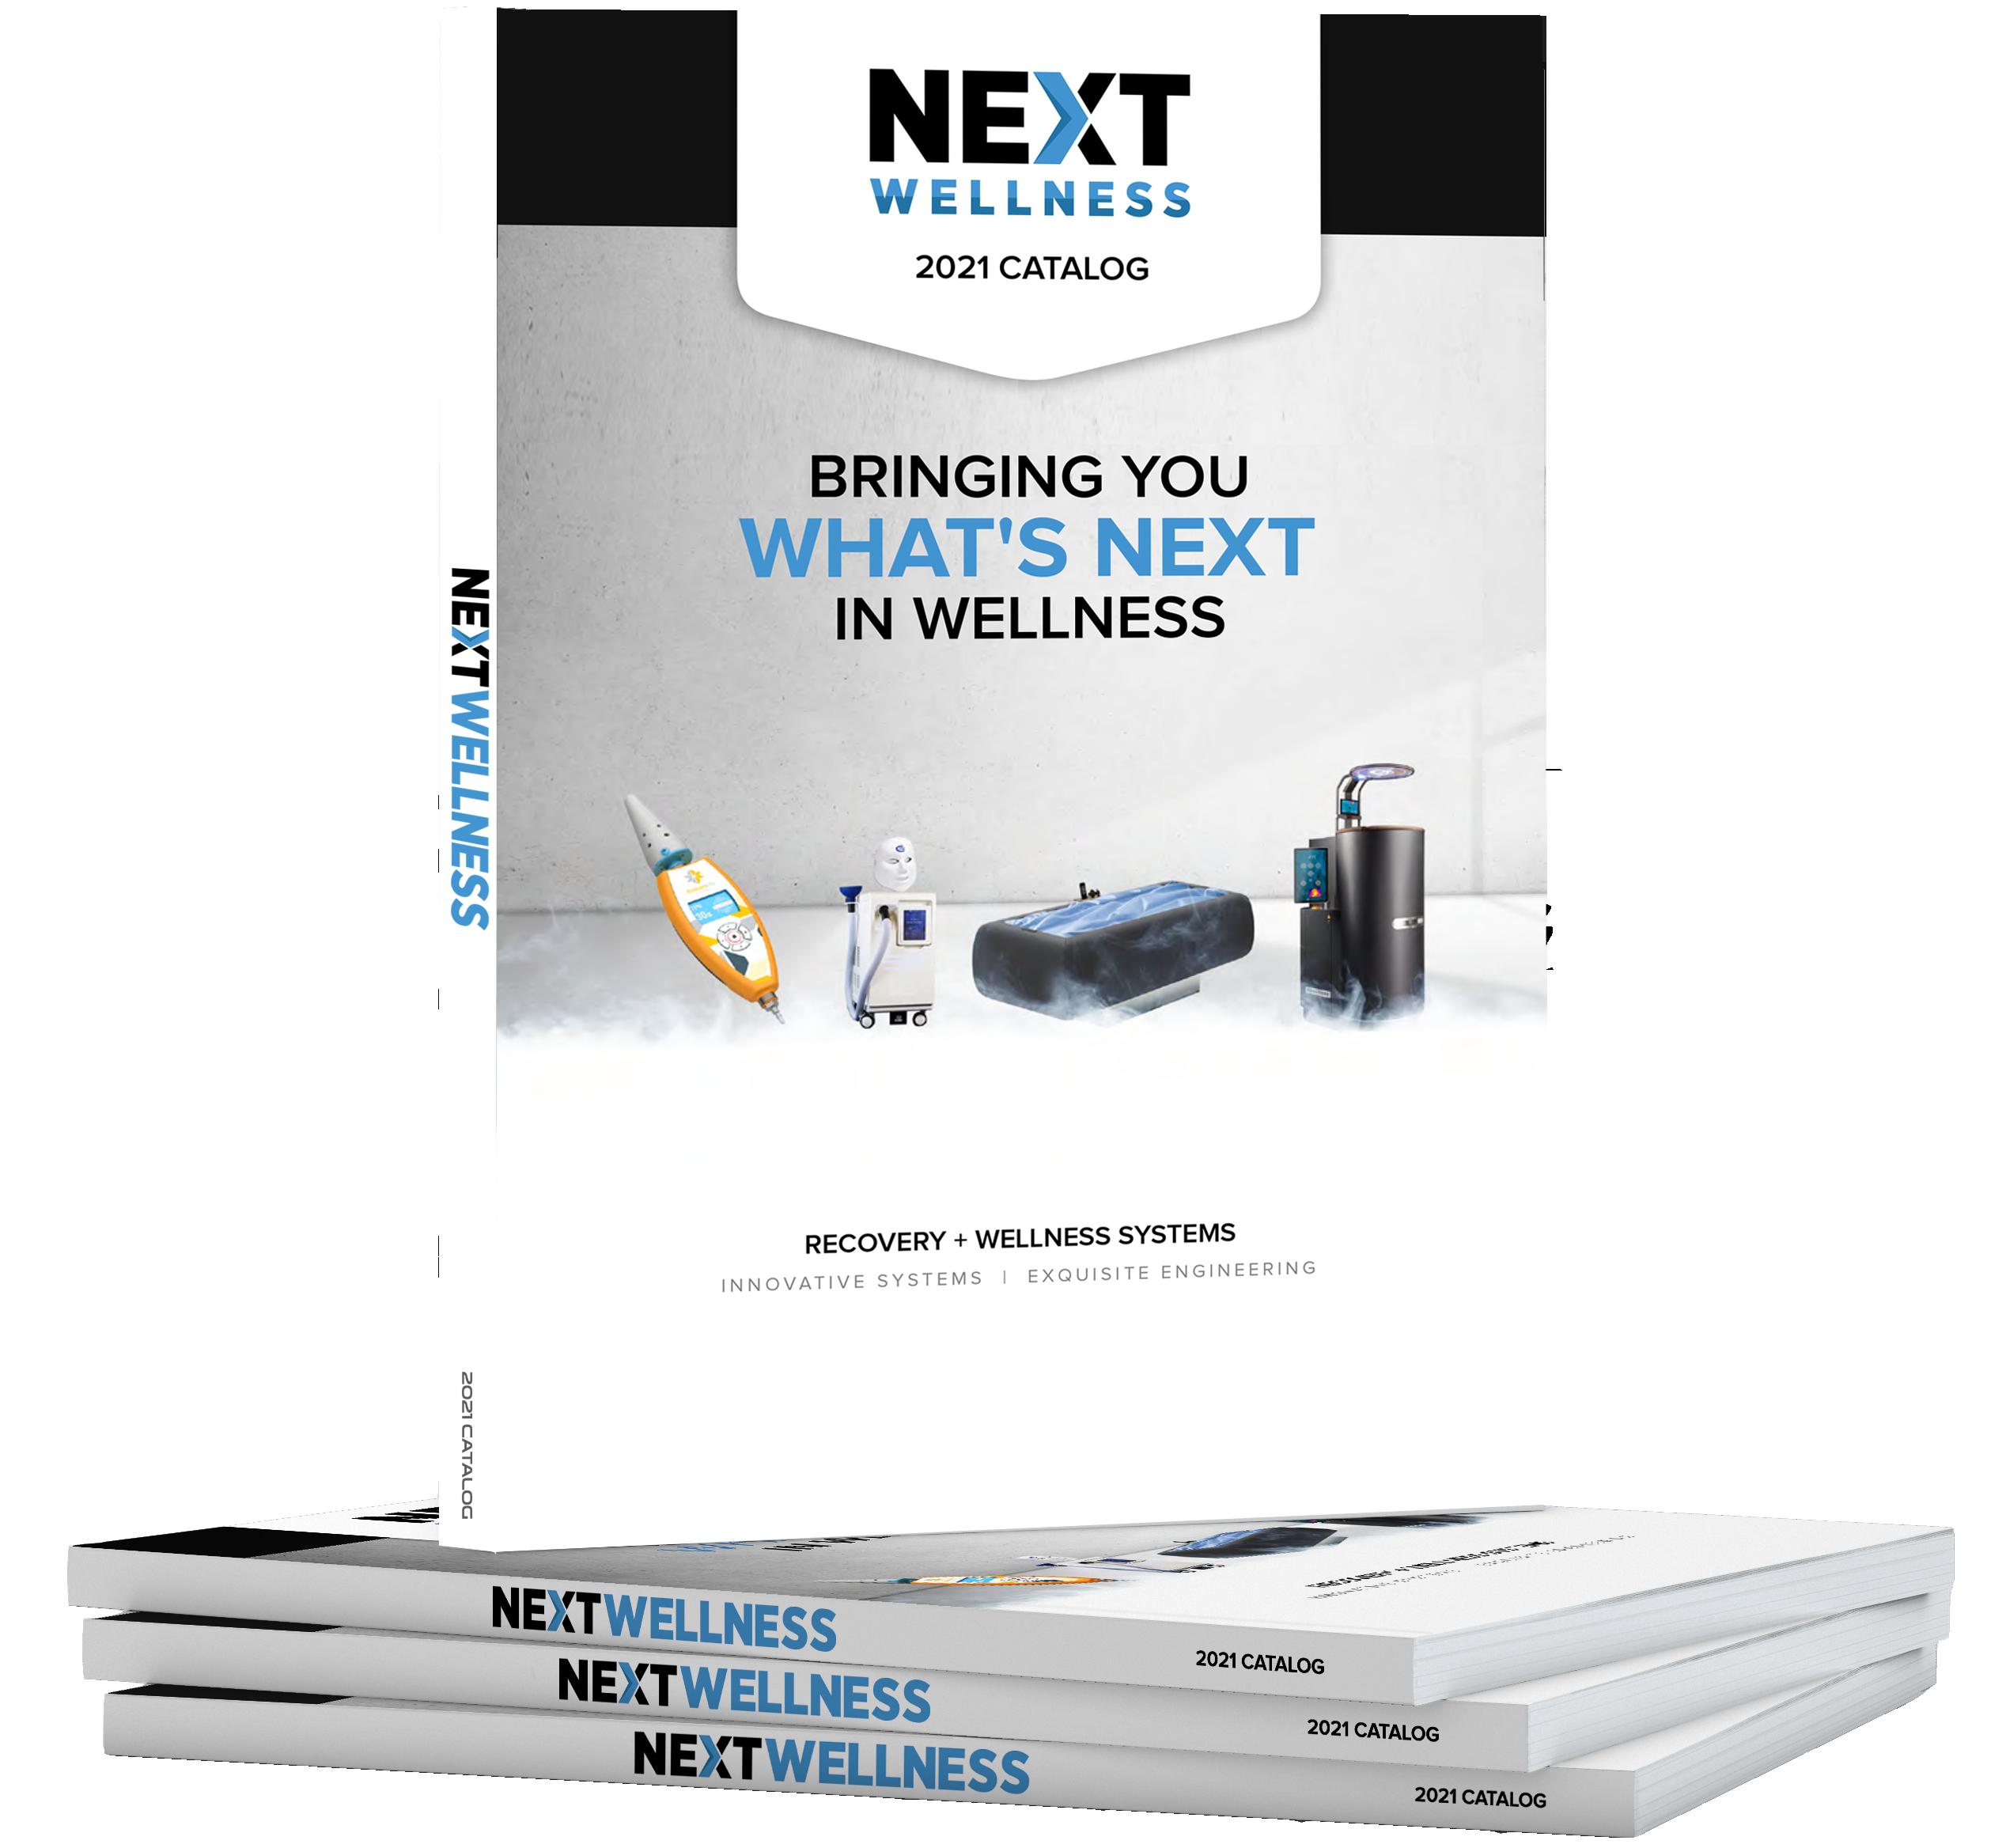 NEXT Wellness 2021 Catalog